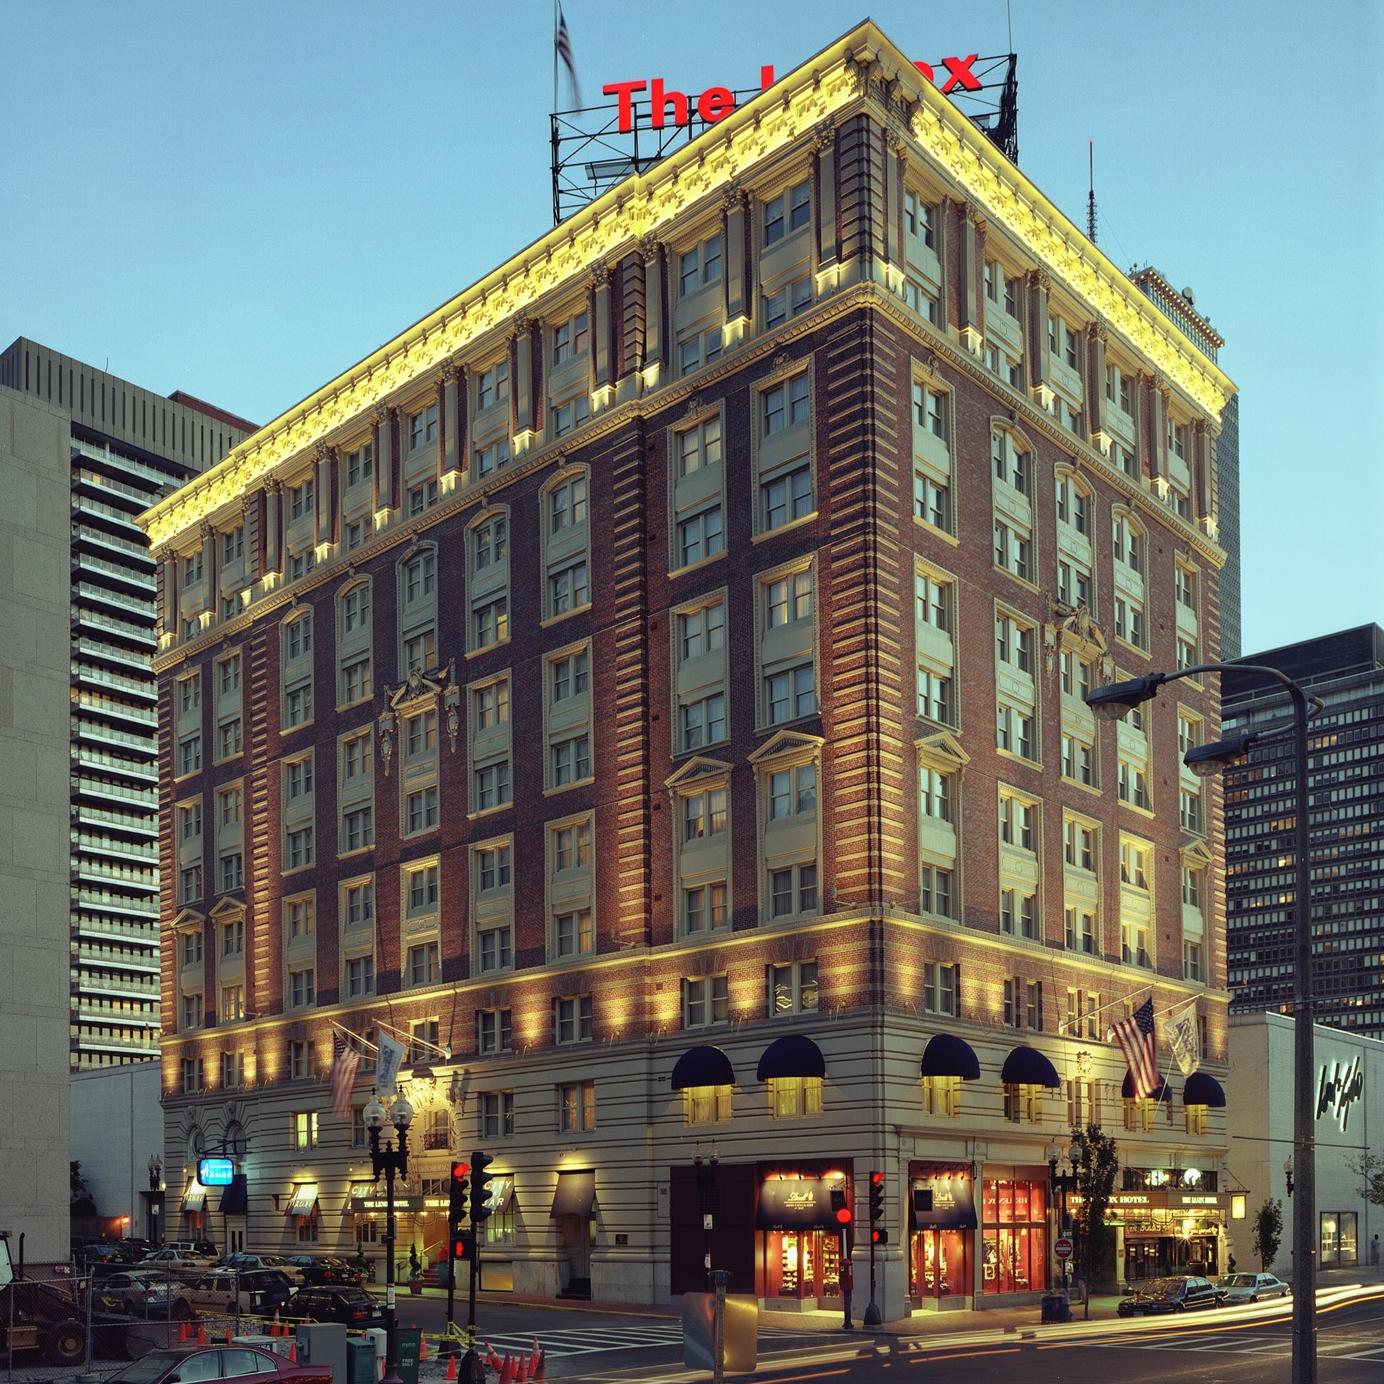 The Lenox in Boston, MA